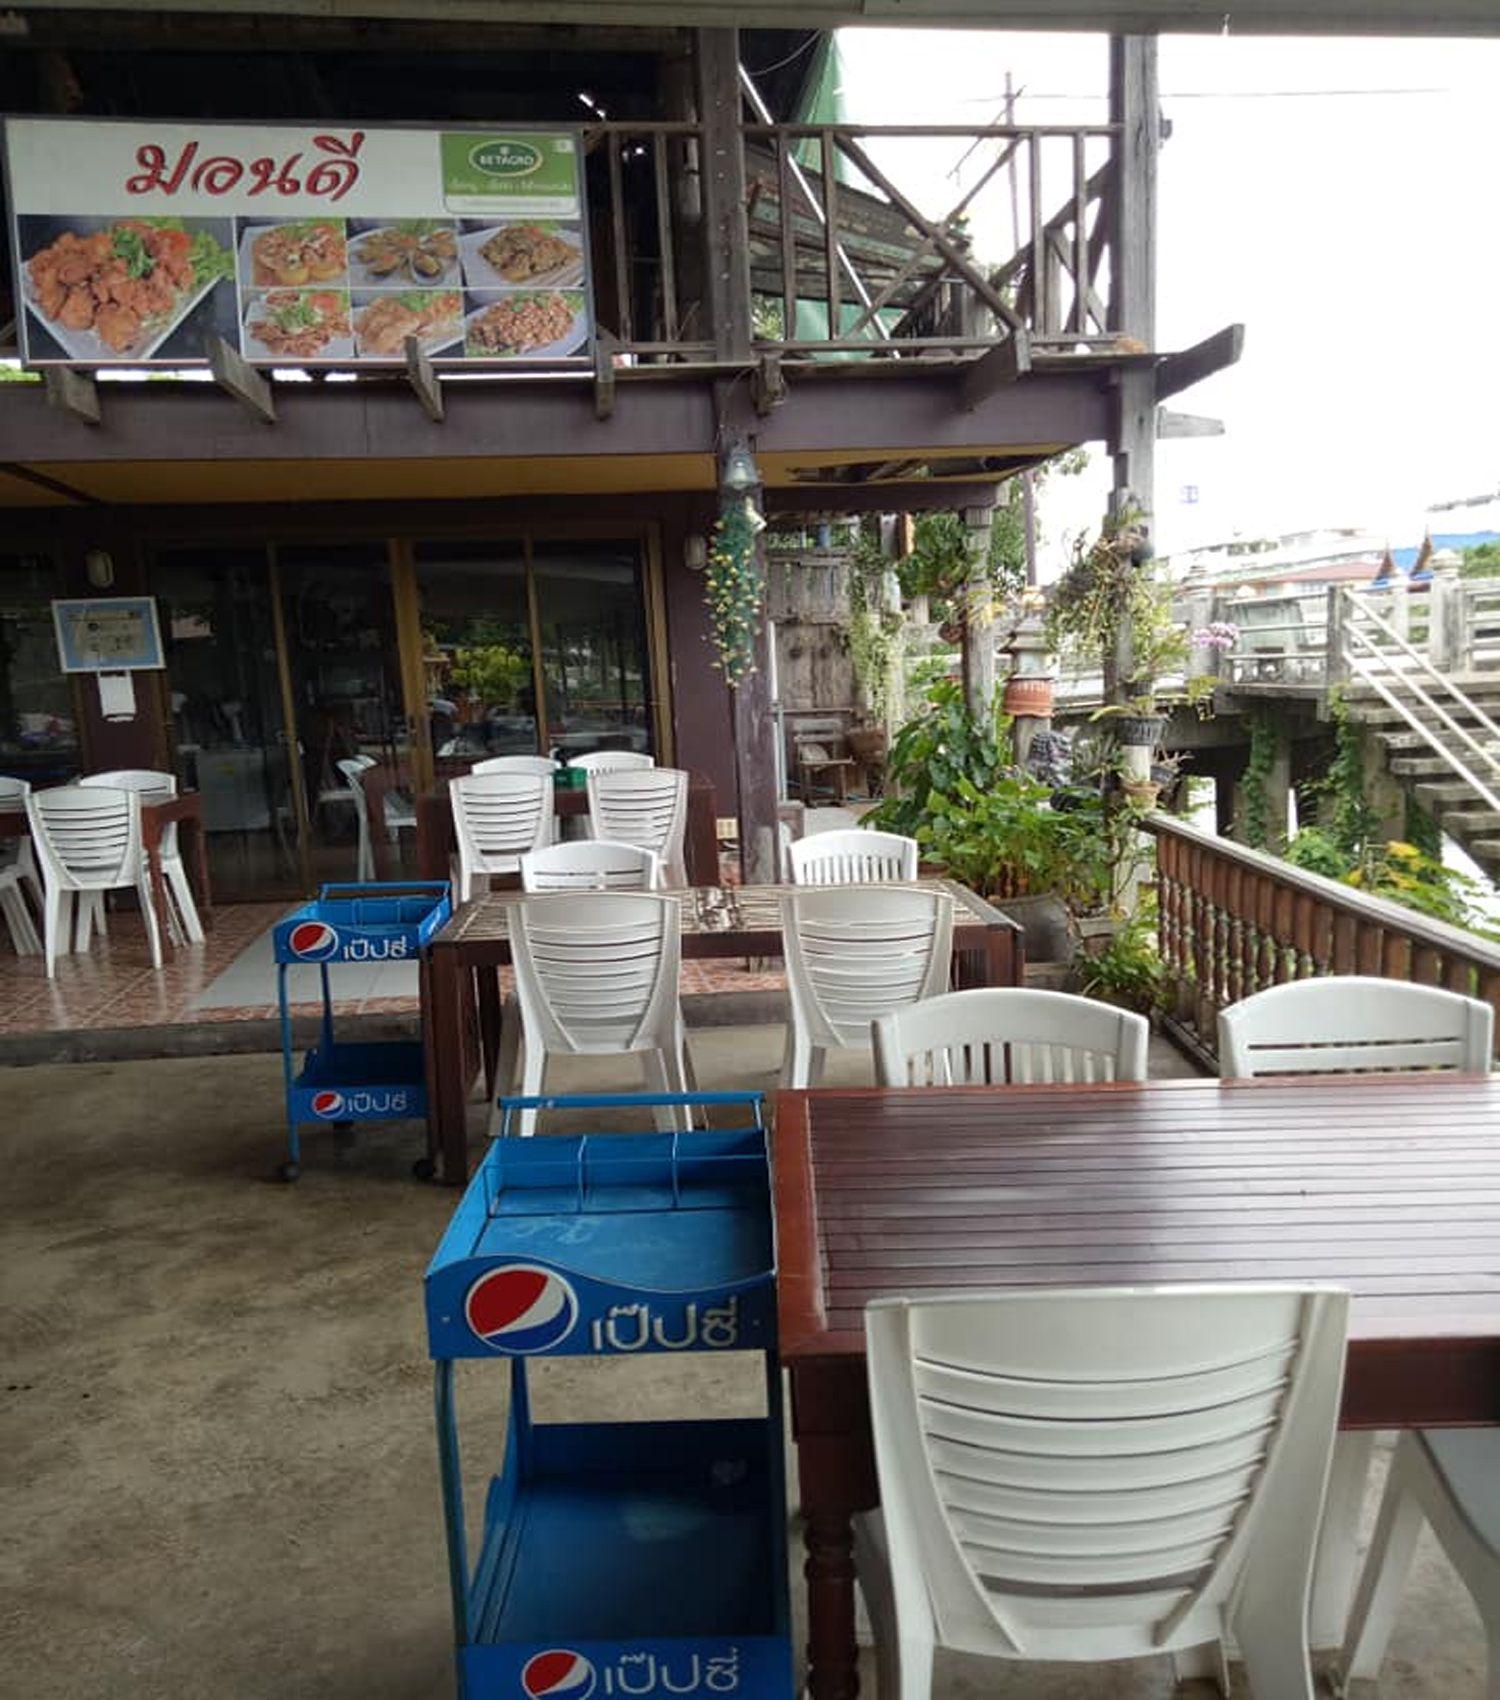 Mondee restaurant